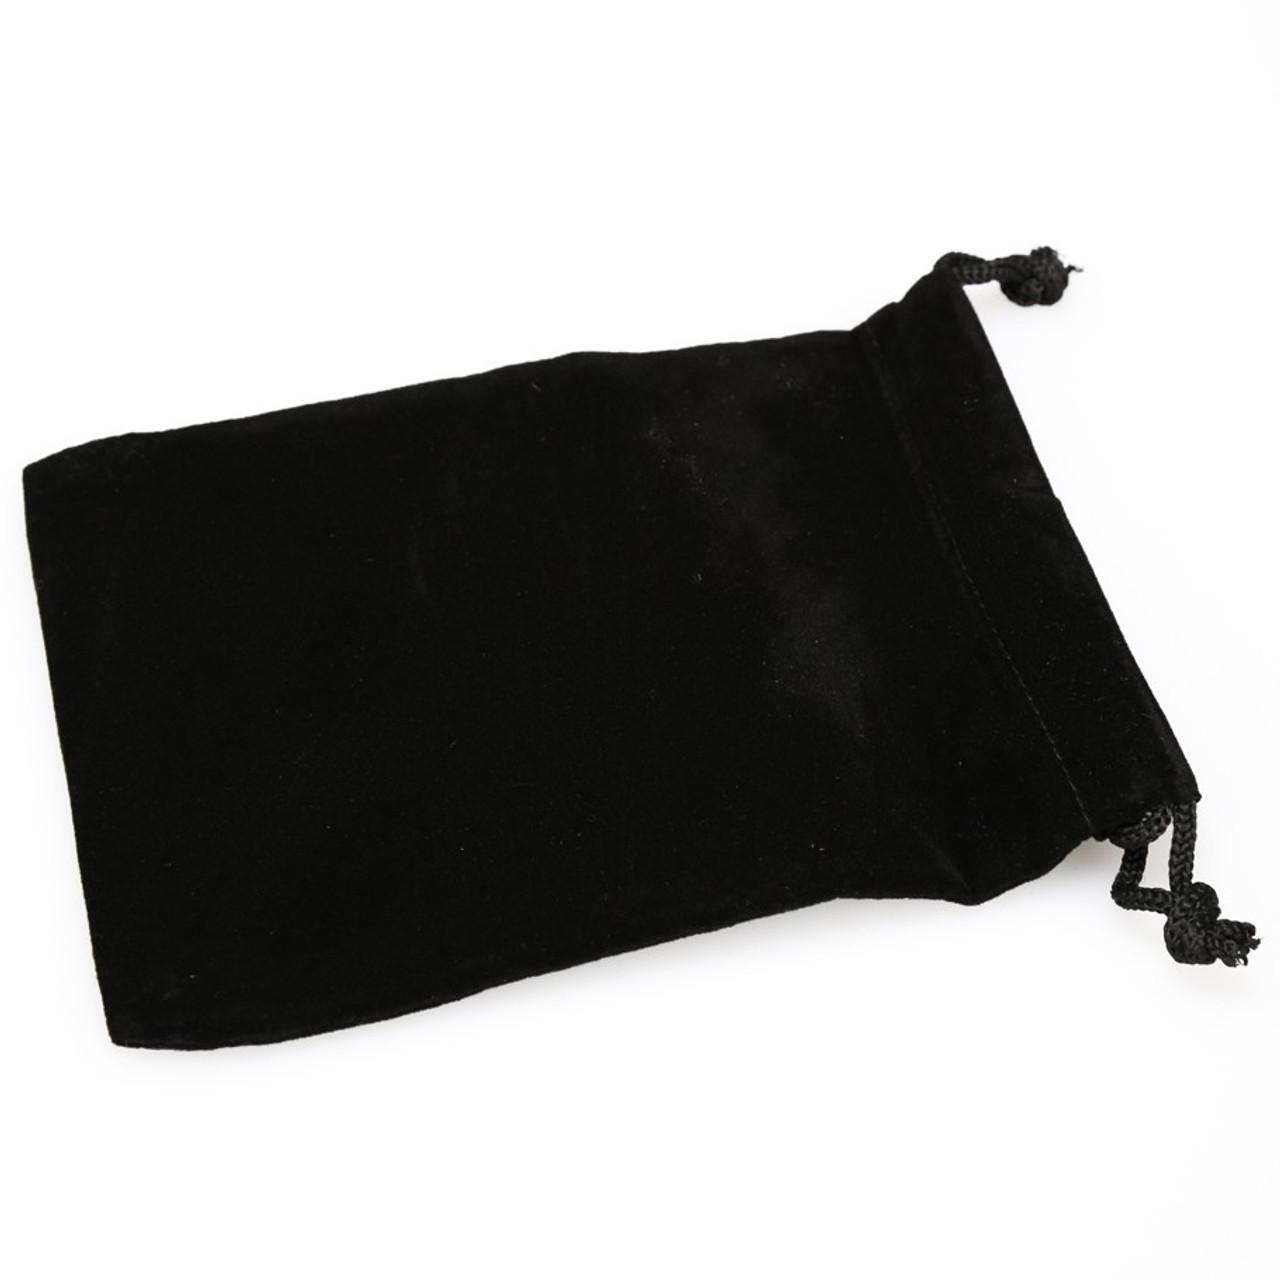 5 16mm Dice Standard Transparent Square Cornered with Black Velvet Cloth Pouch Bag Set of